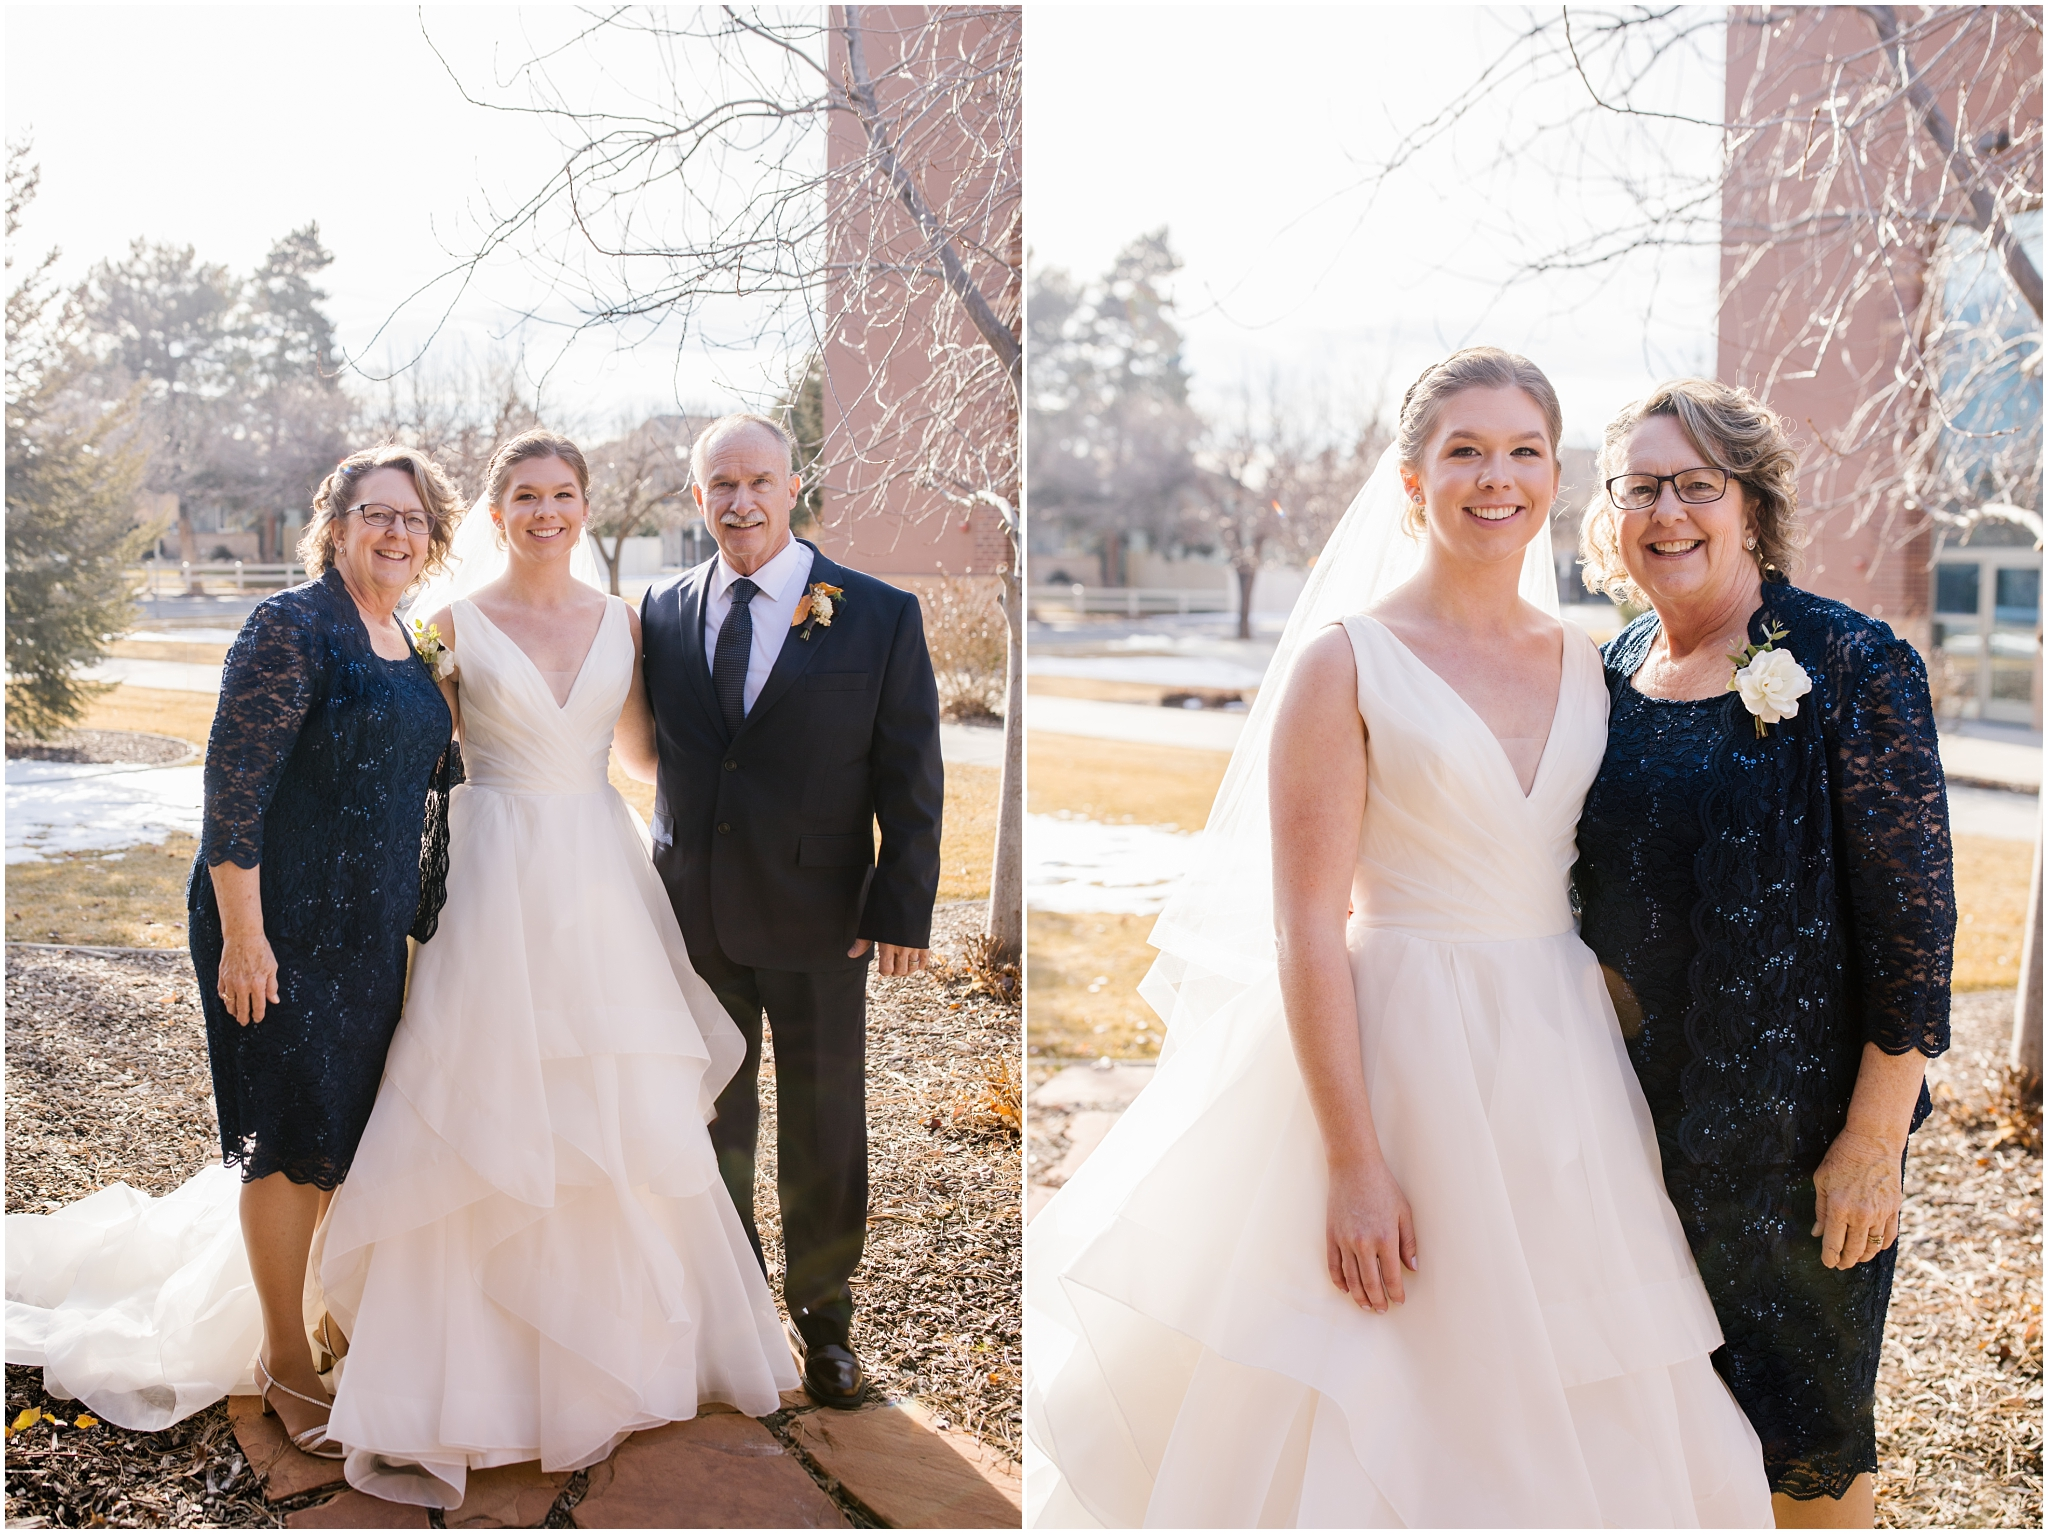 CN-Wedding-83_Lizzie-B-Imagery-Utah-Wedding-Photographer-Blessed-Sacrament-Catholic-Church-Sandy-Utah-The-Blended-Table-Salt-Lake-City.jpg